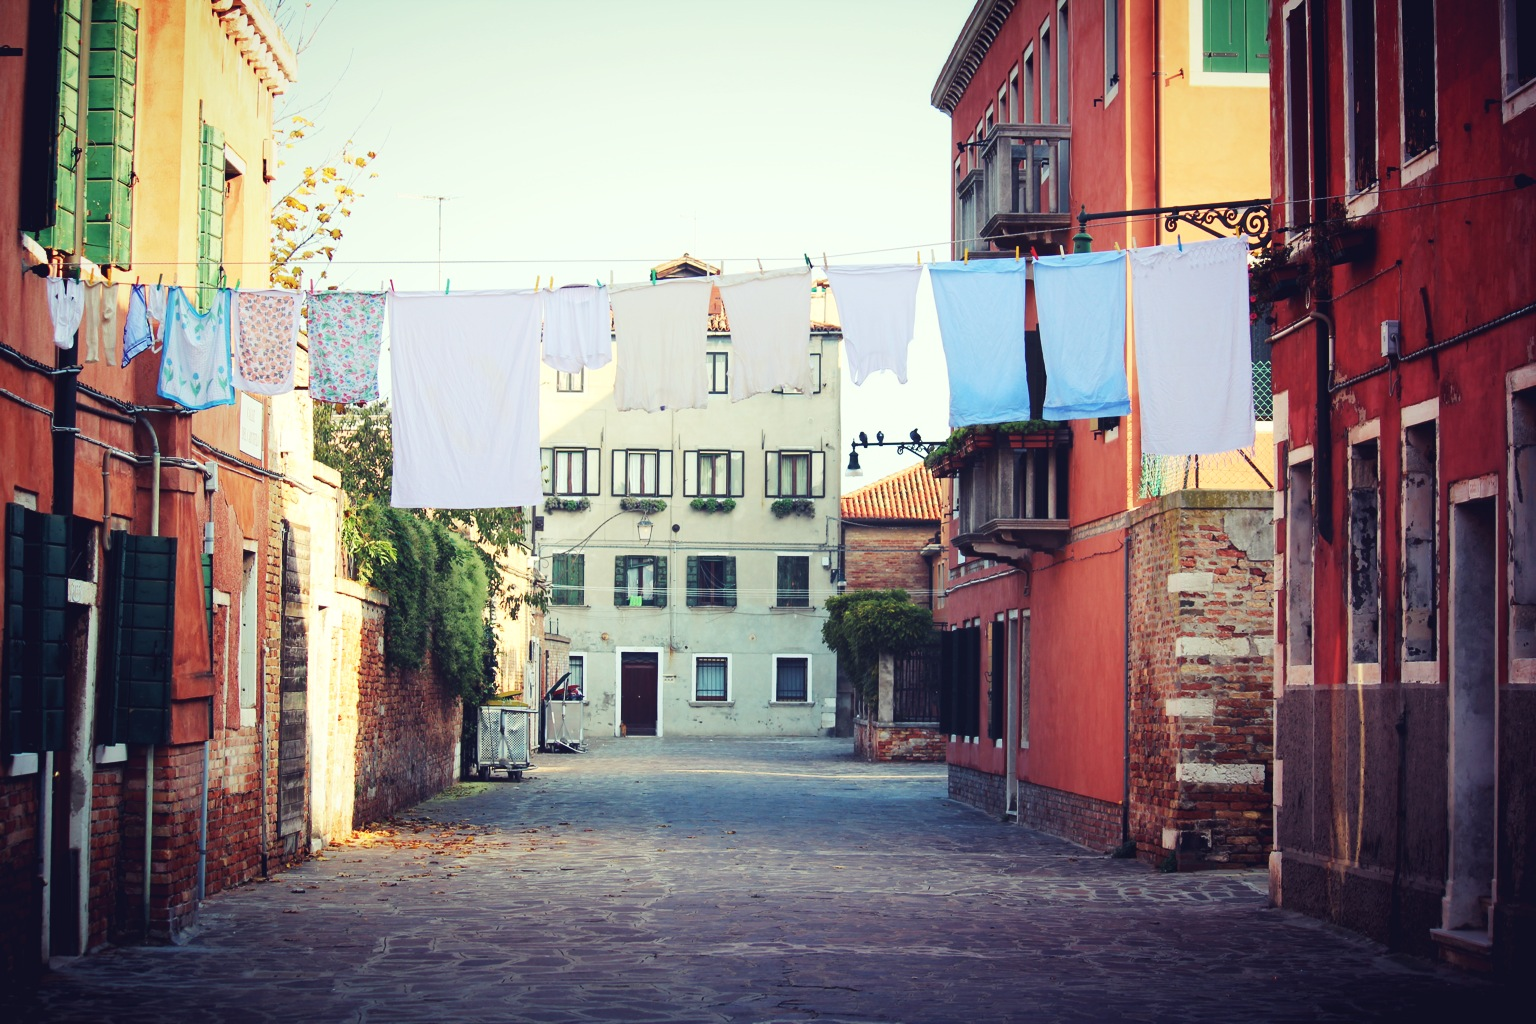 italian dwelling clothes hanging.jpg